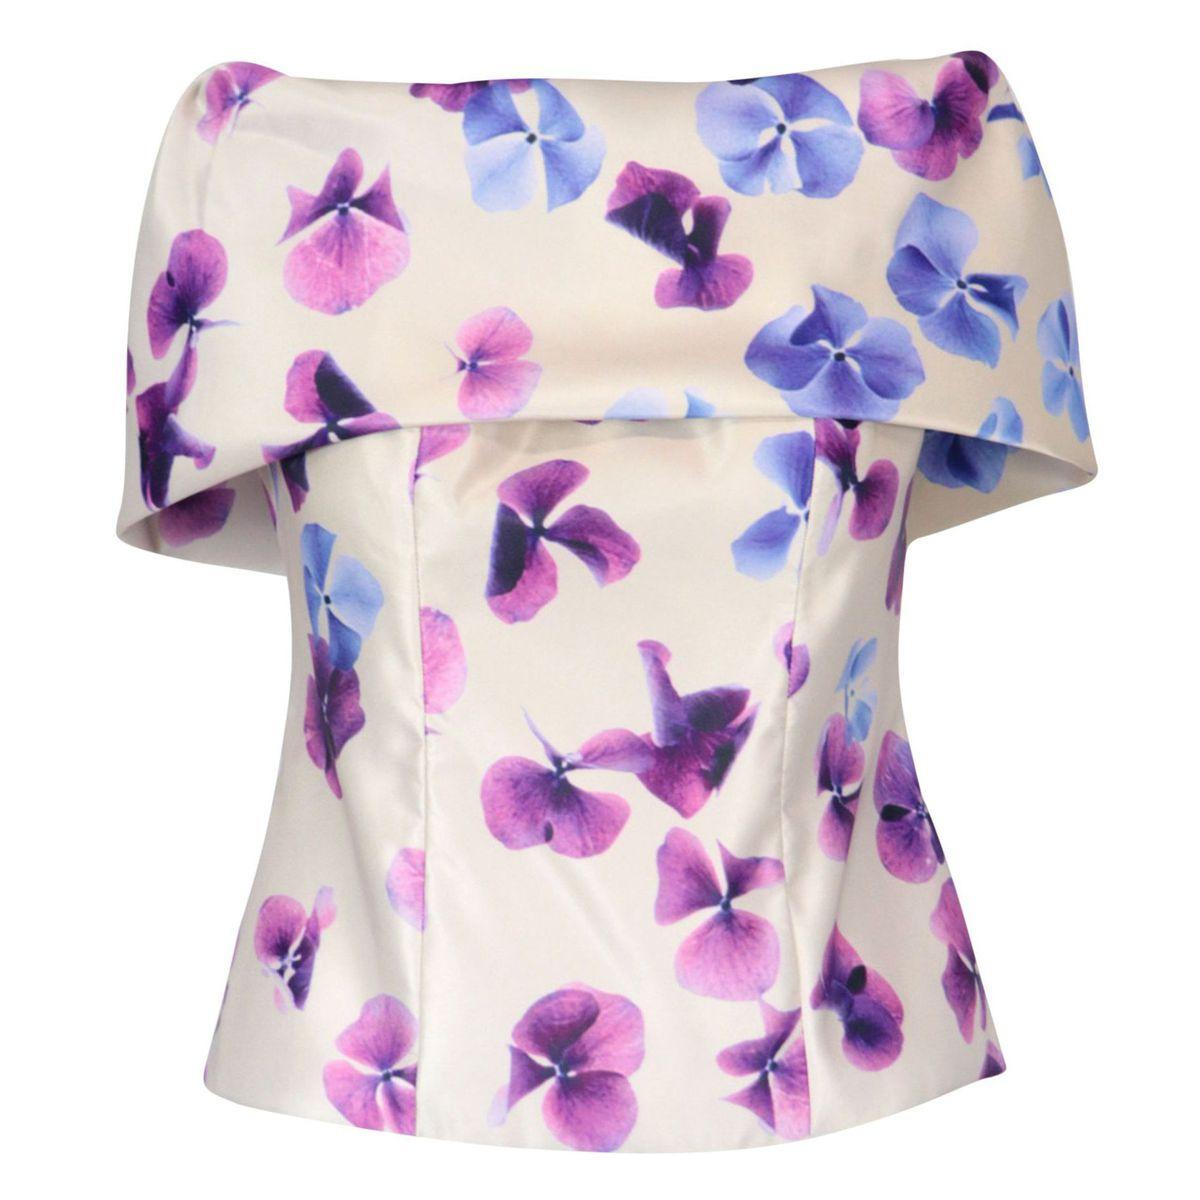 Bustier top in hydrangea printed duchess Beige / violet flowers GIADA CURTI